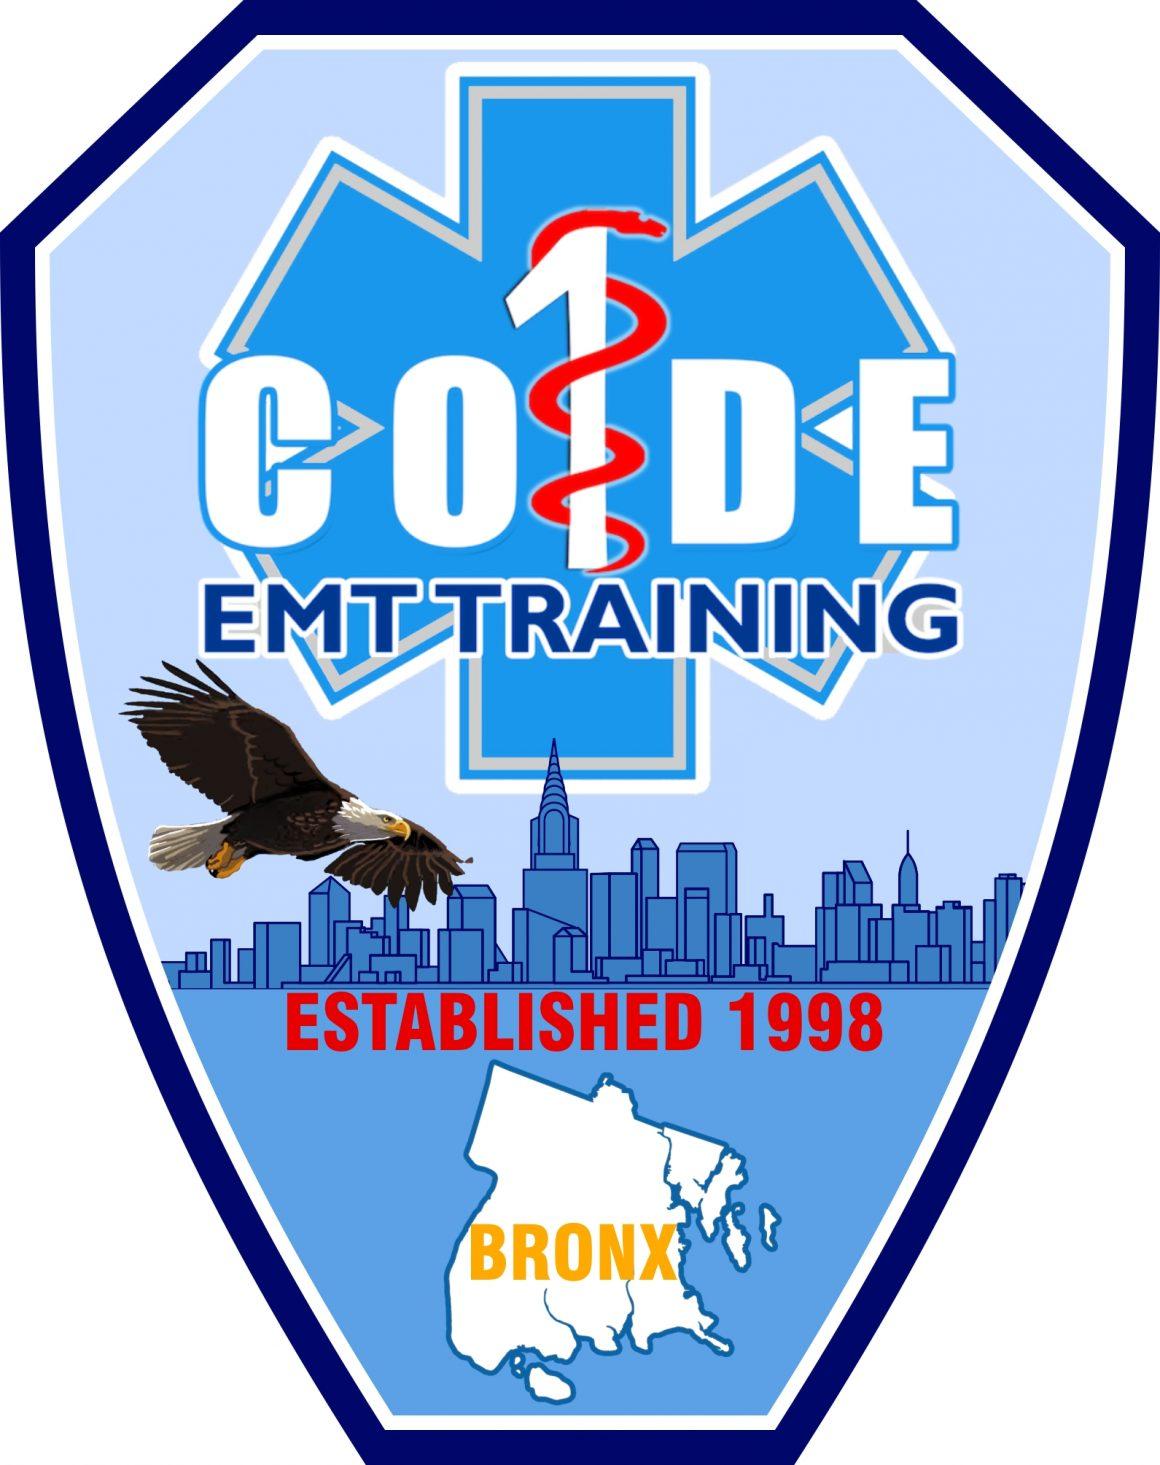 Code One Inc Original EMT Course – October 28, 2019 – February 18, 2020 – MORNING 9:30am – 1:30pm @ Code One Inc